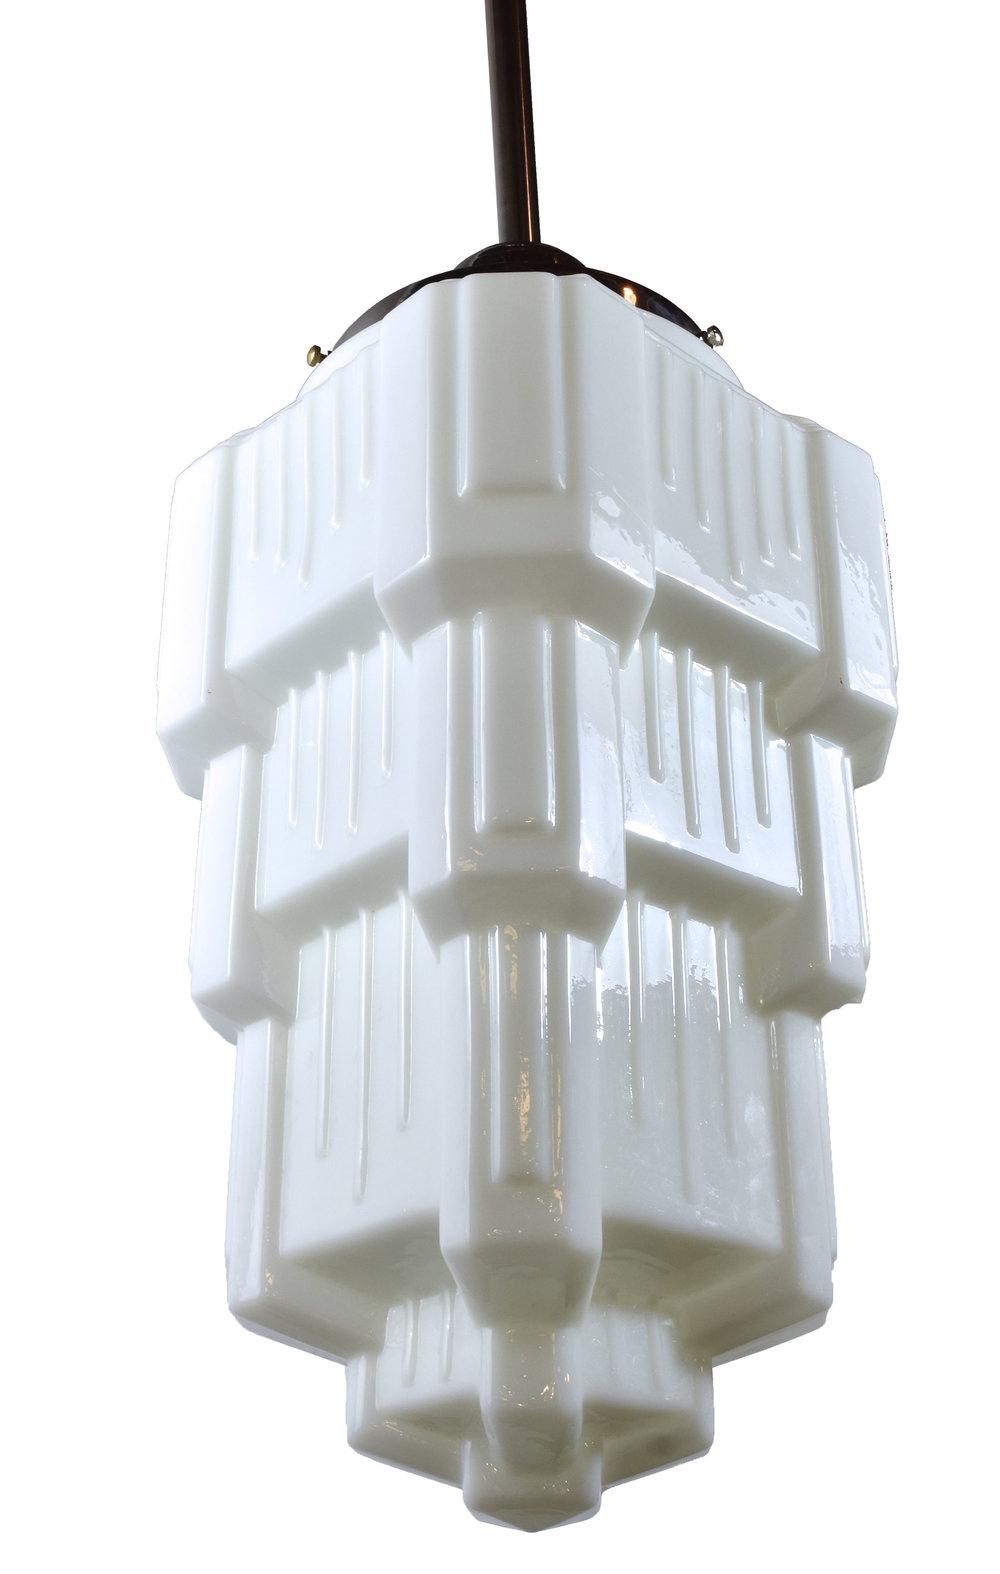 48040 SKY SCRAPER DECO PENDANTS 1.jpg